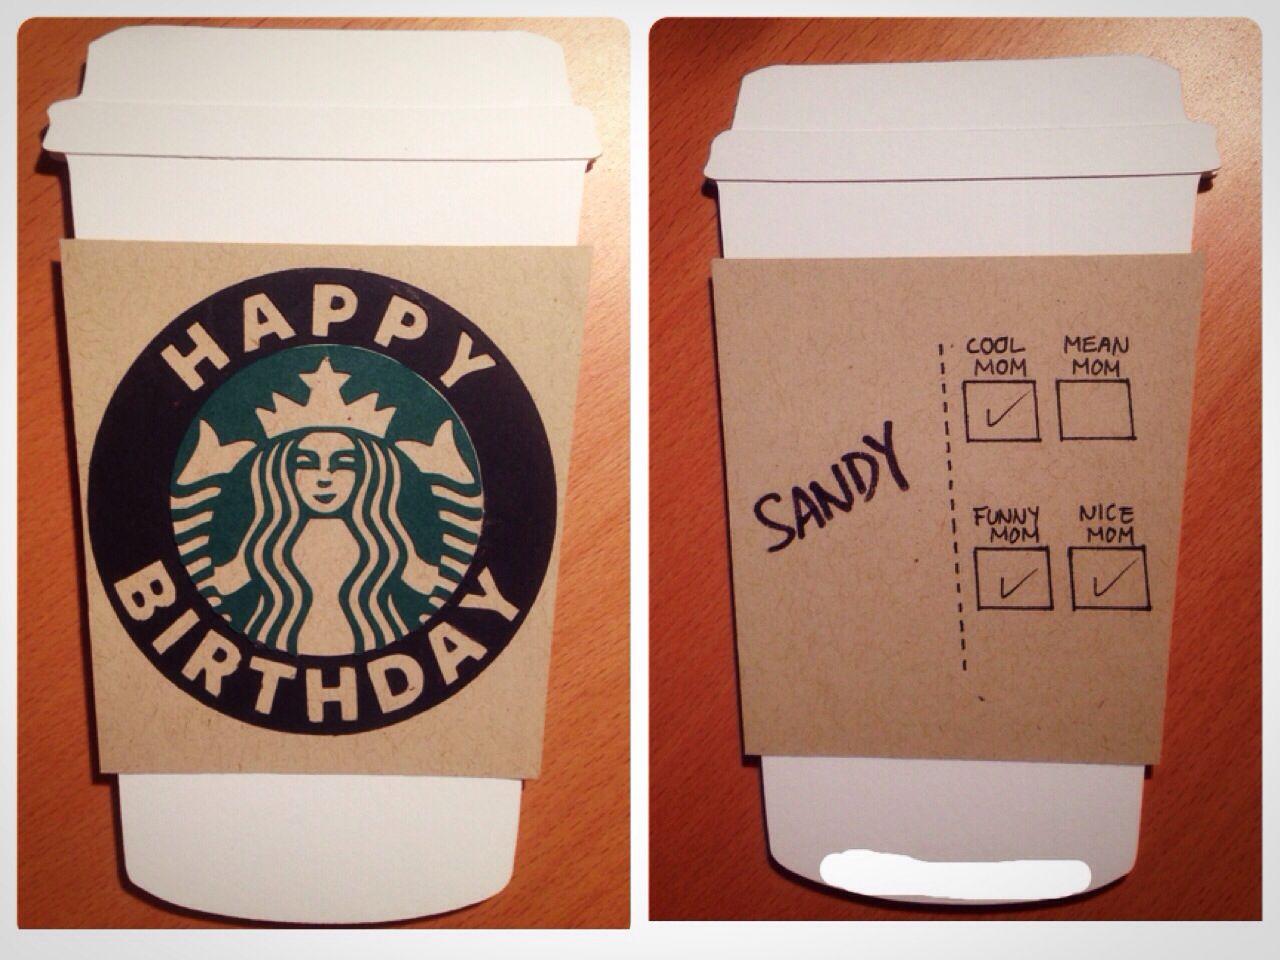 Starbucks happy birthday card Starbucks card, Happy